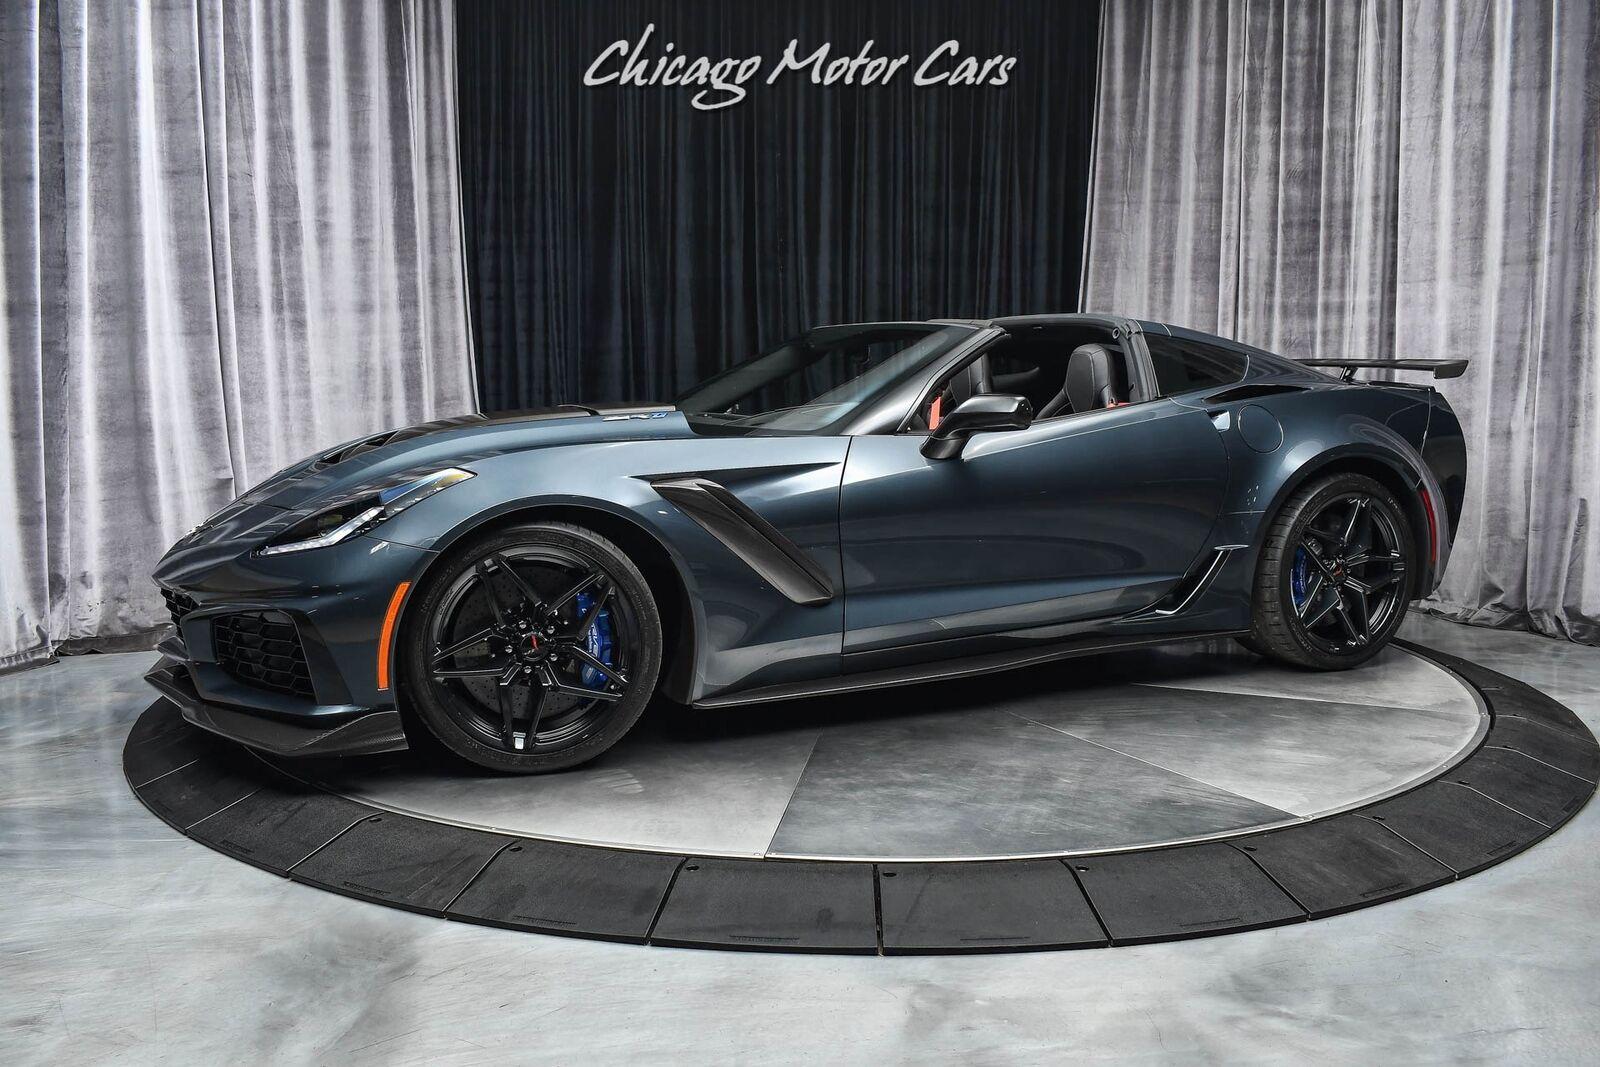 2019 Gray Chevrolet Corvette ZR1  | C7 Corvette Photo 1